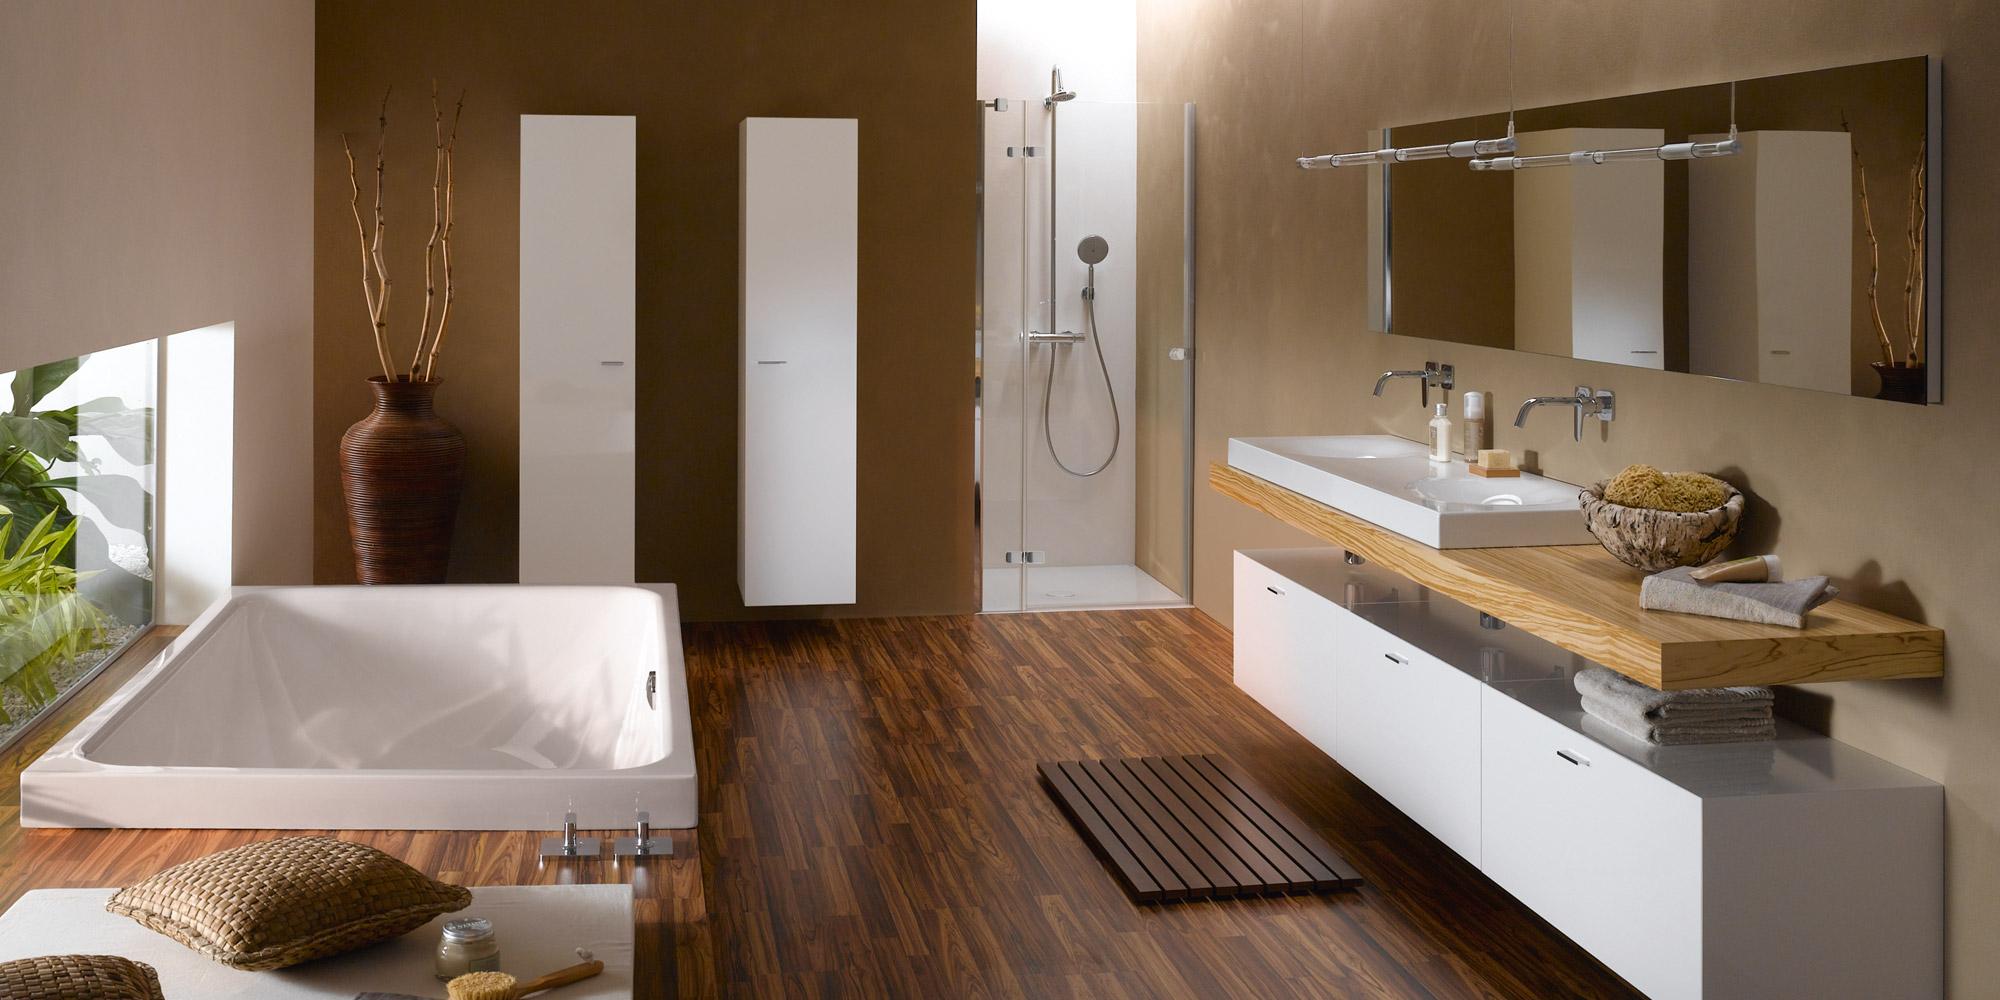 badezimmer braunfliesen. Black Bedroom Furniture Sets. Home Design Ideas